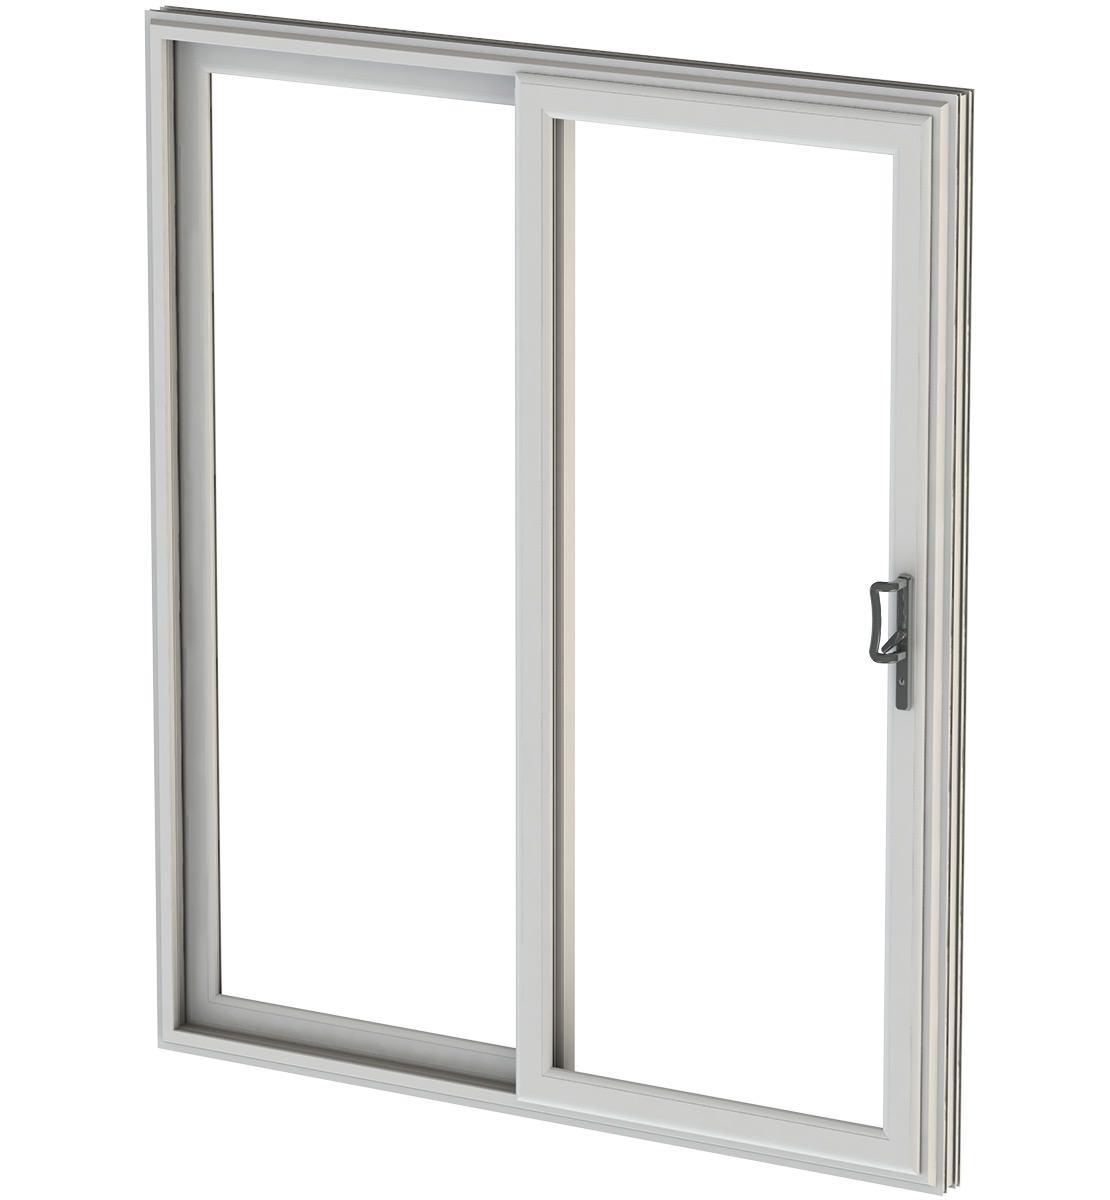 Our range of uPVC Sliding Patio Doors | Liniar uPVC Profile on